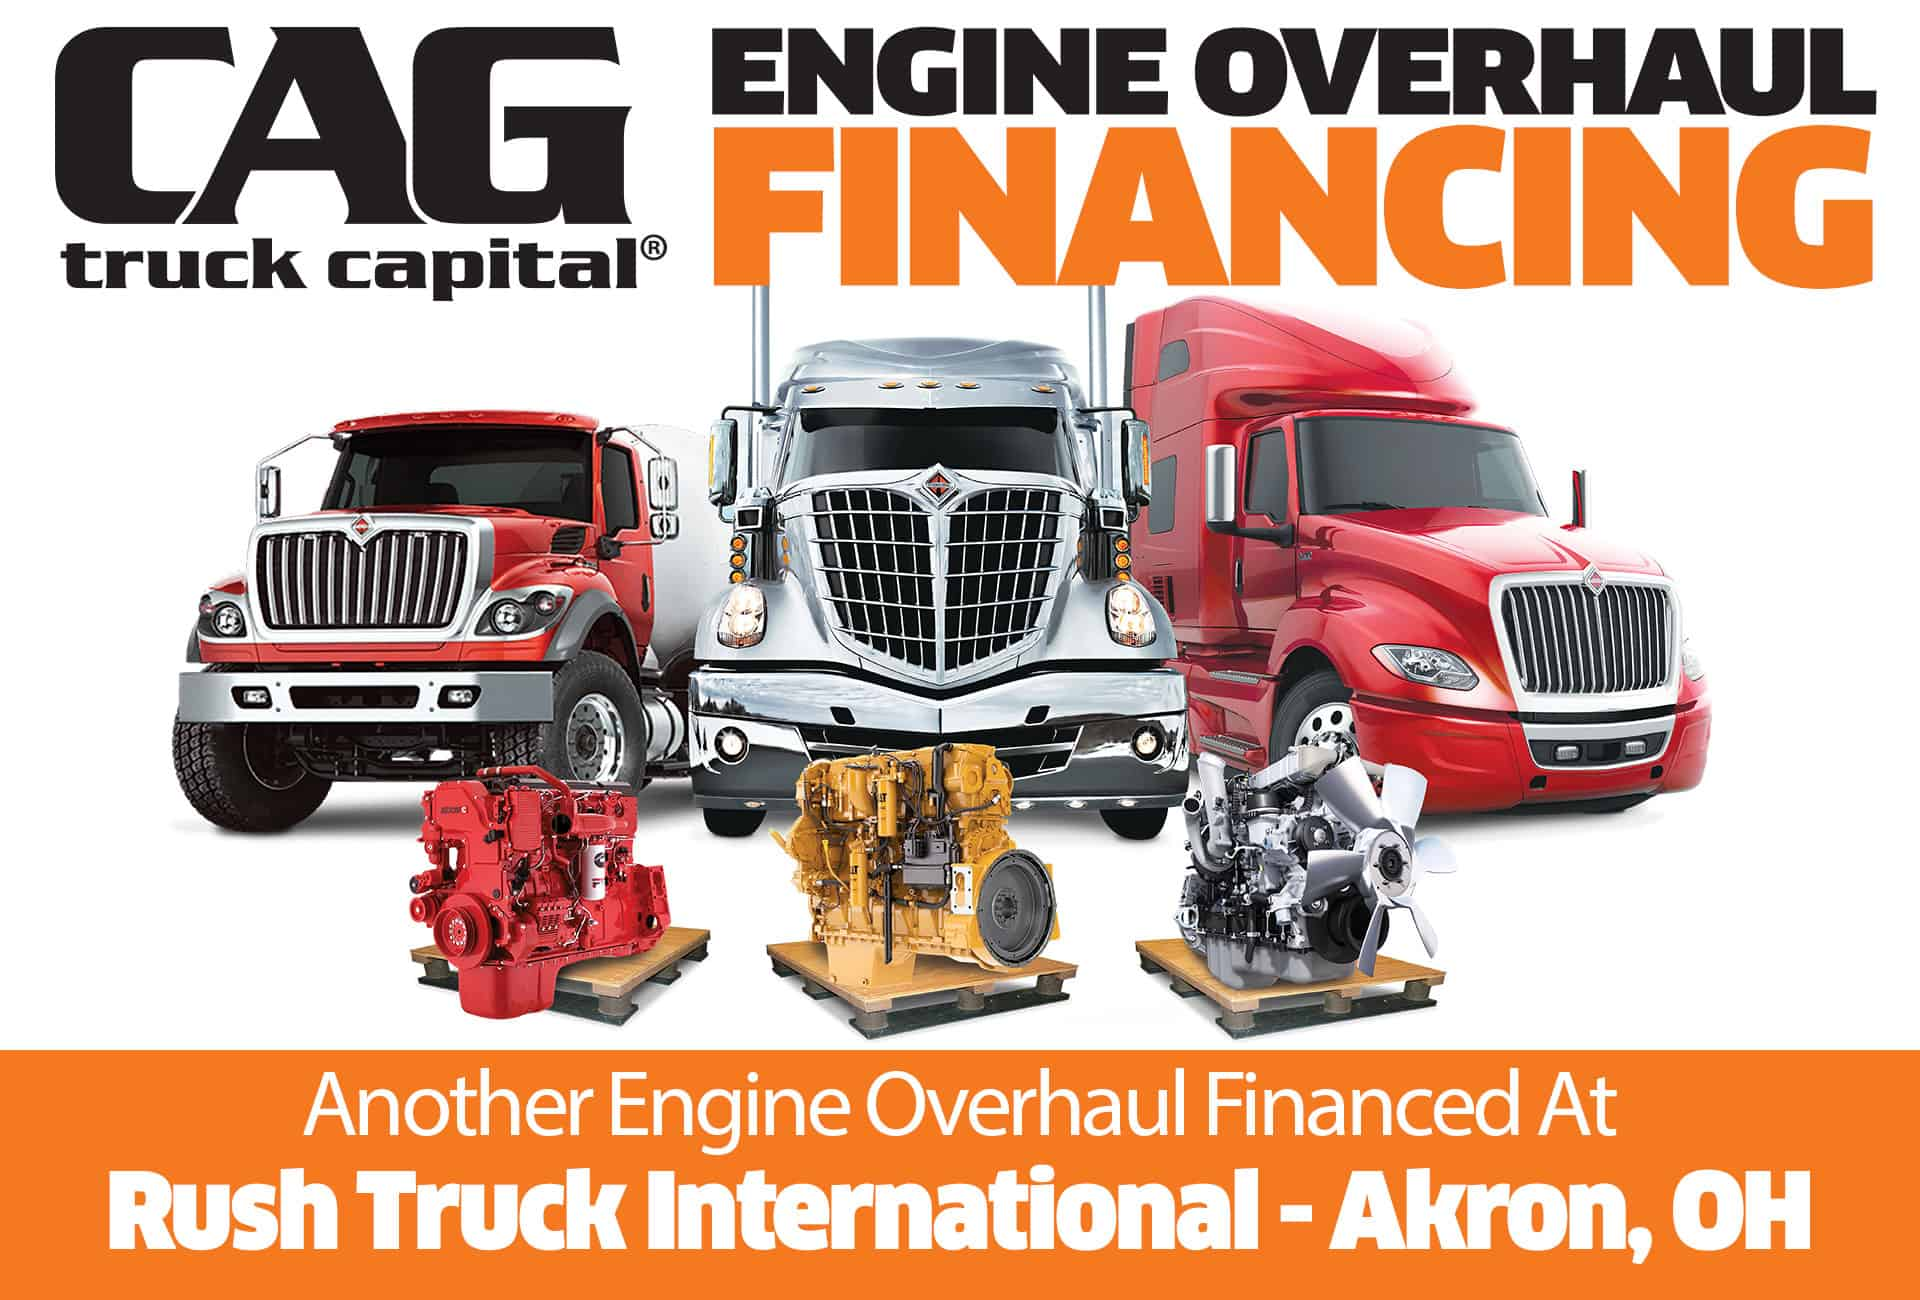 Rush International Engine Overhaul Financing Akron OH